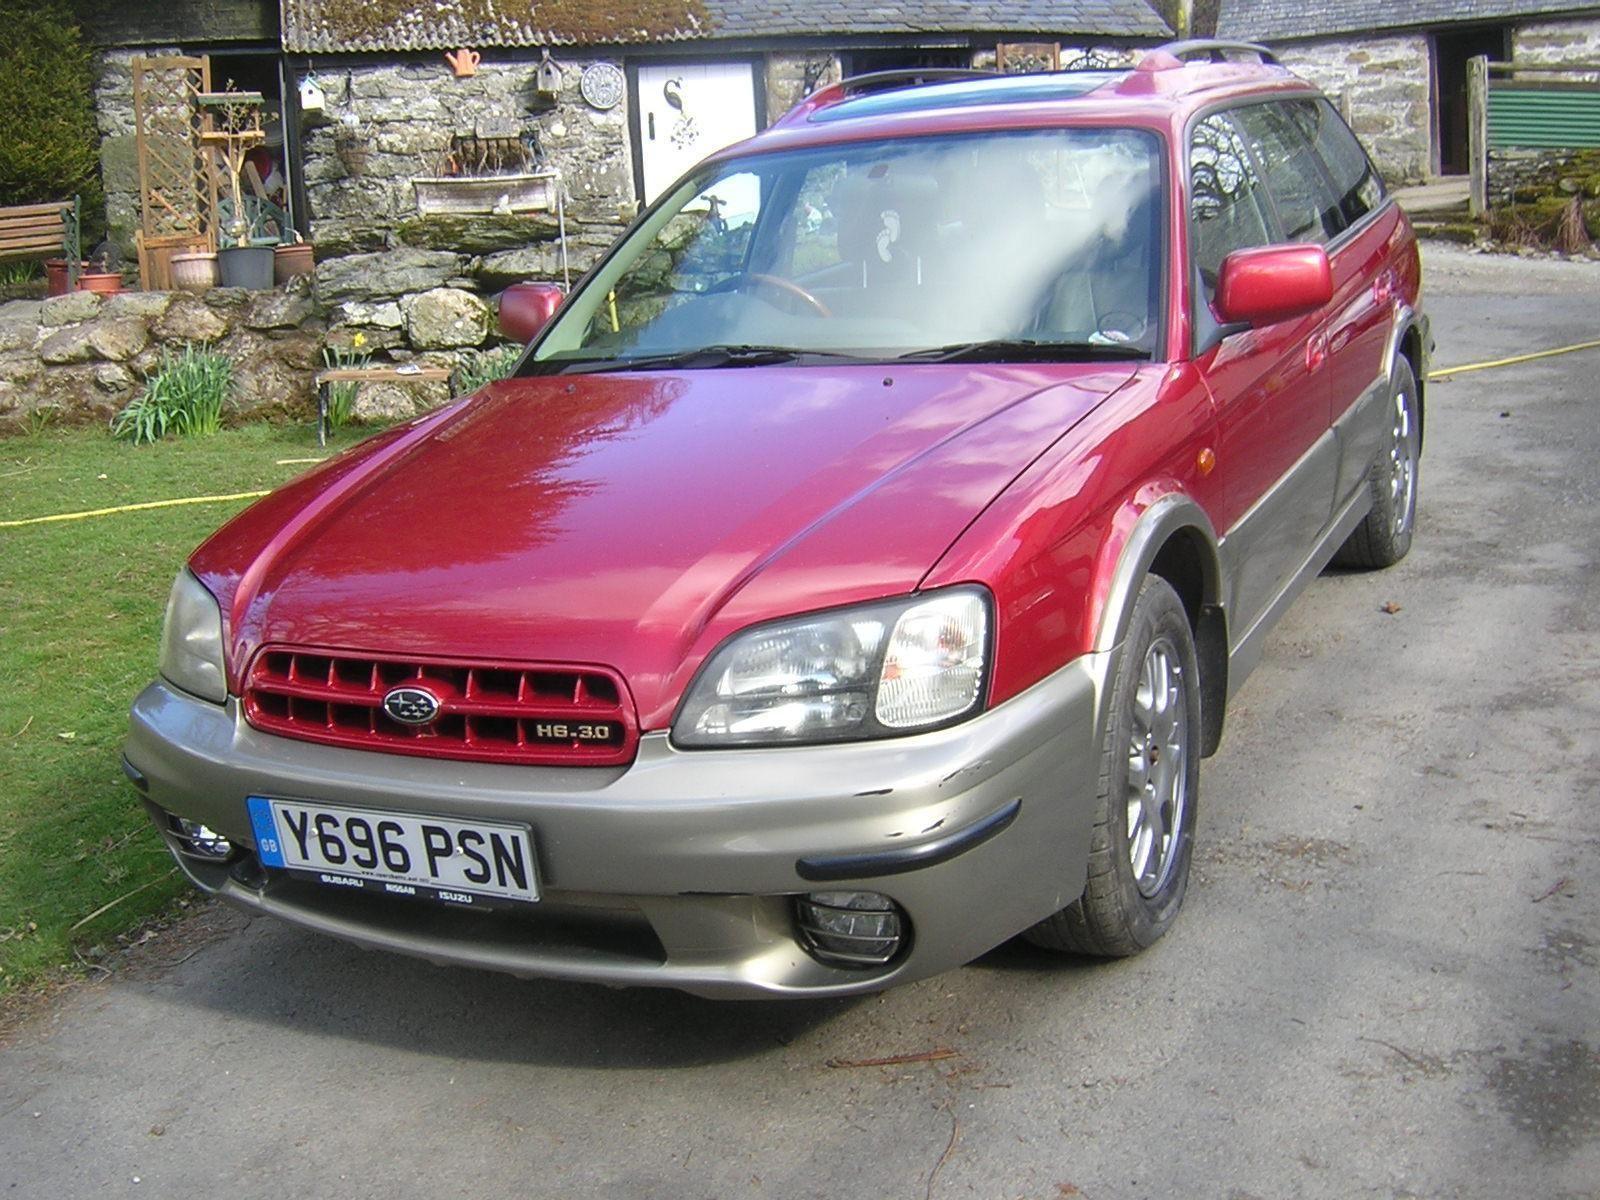 01 subaru legacy outback 30 h6 auto luxpack estate metallic red